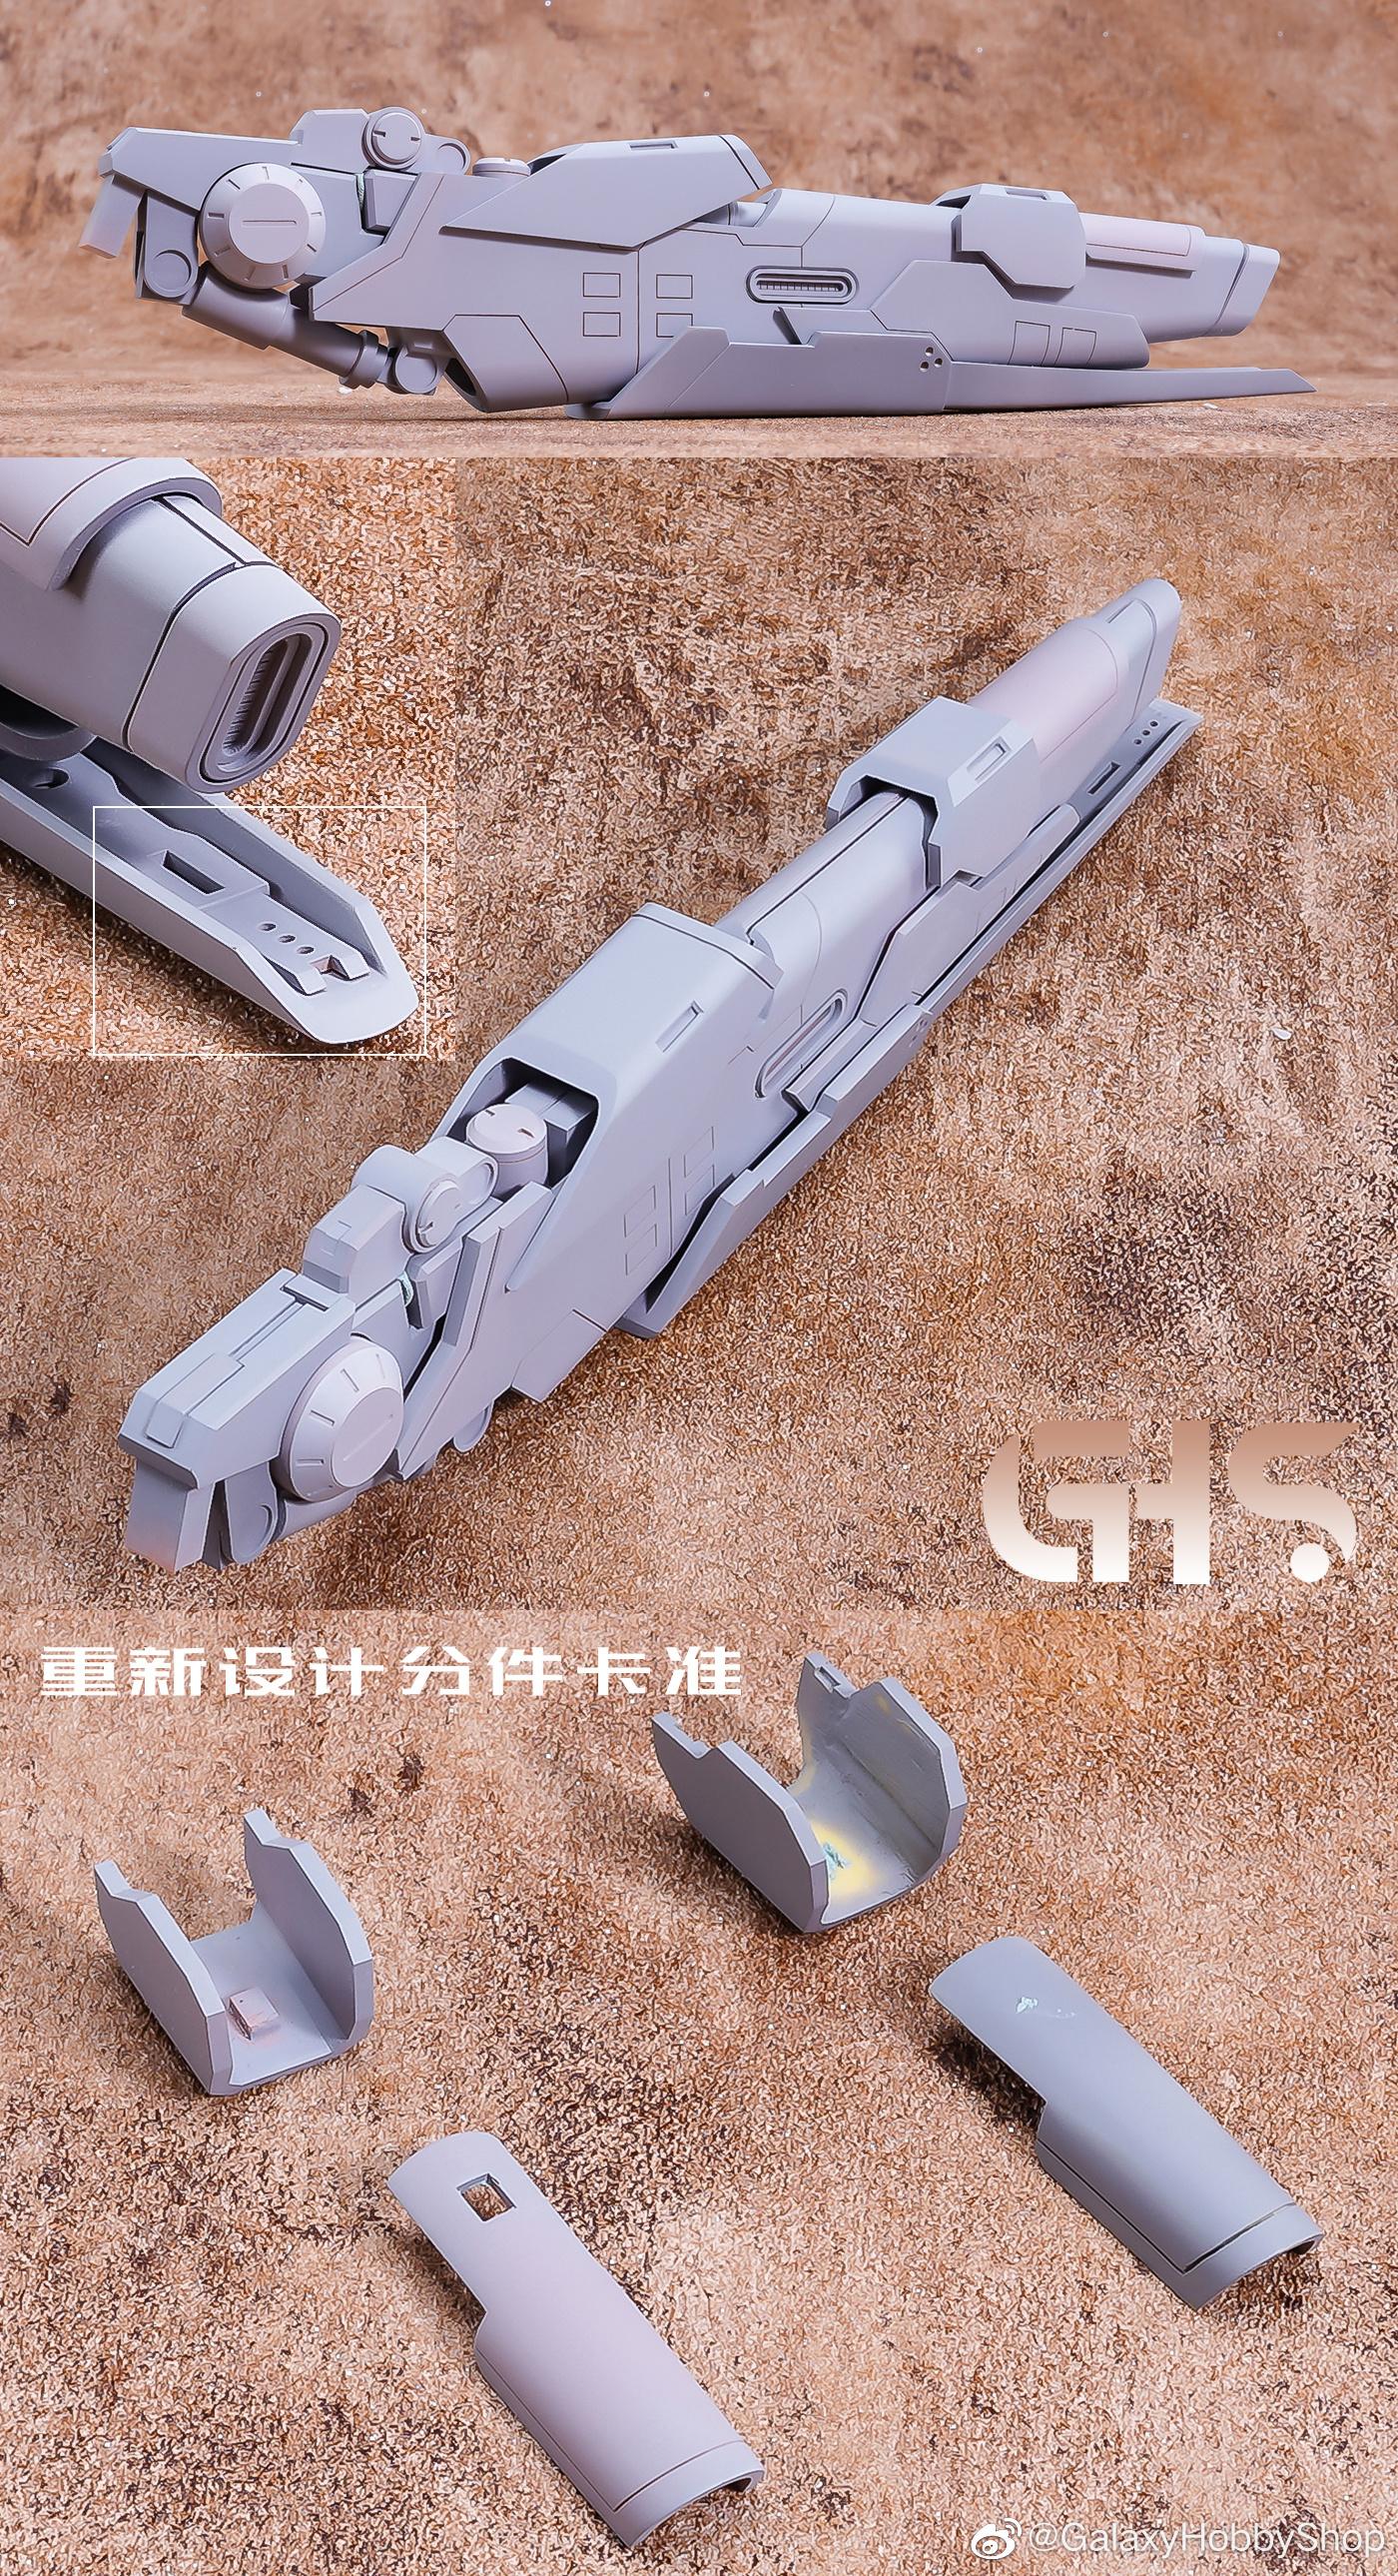 G871_GS_GSH_the_o_GK_016.jpg